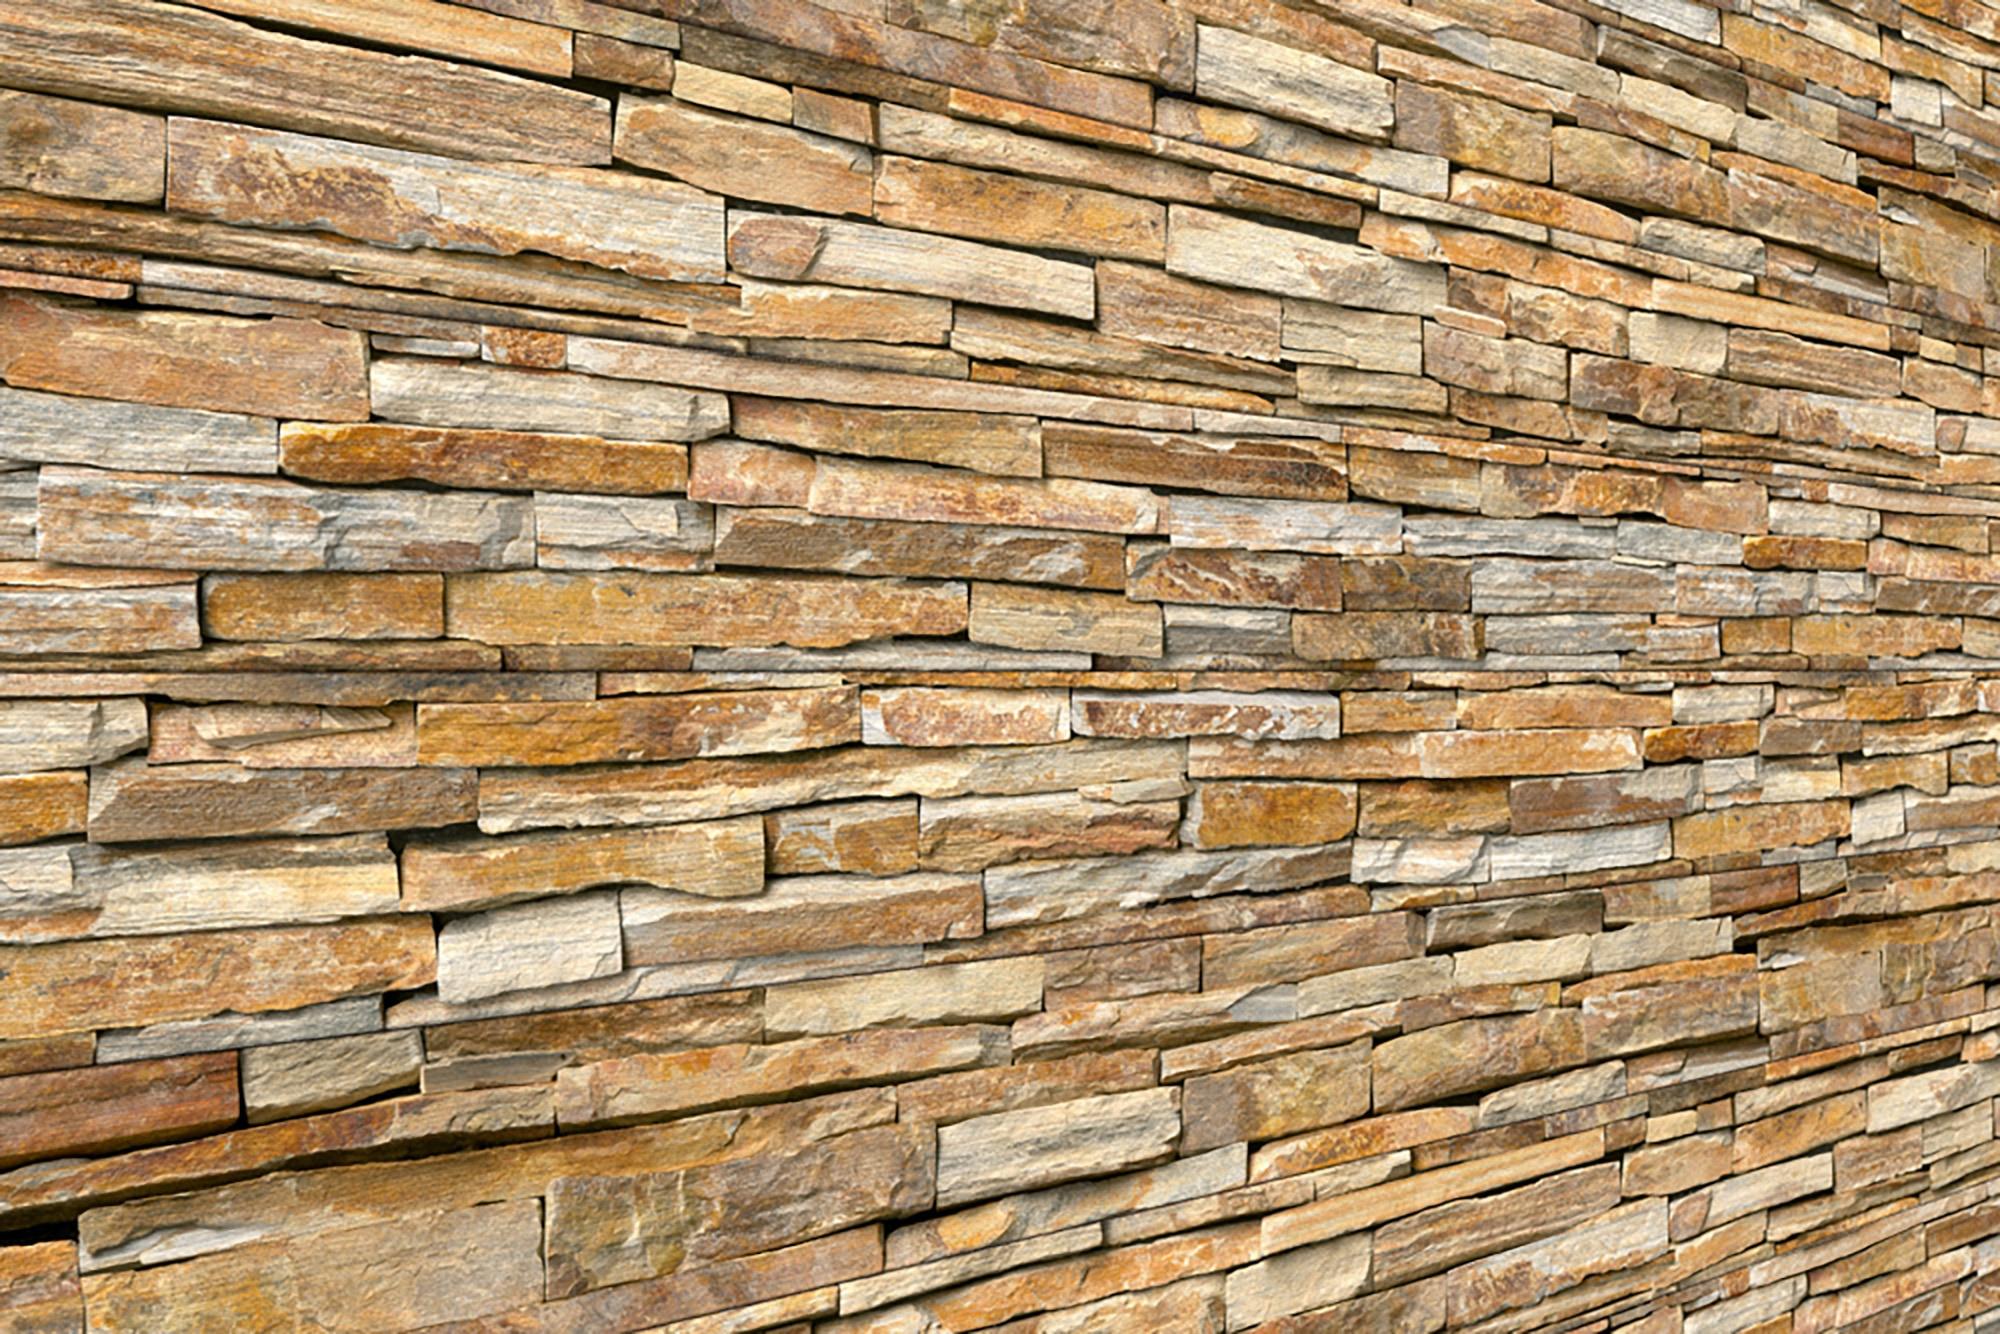 Carrick wall paneling decorative print collection arizona ledge carrick wall paneling decorative print collection arizona ledge stone 57 x 8 x 95mm amipublicfo Choice Image